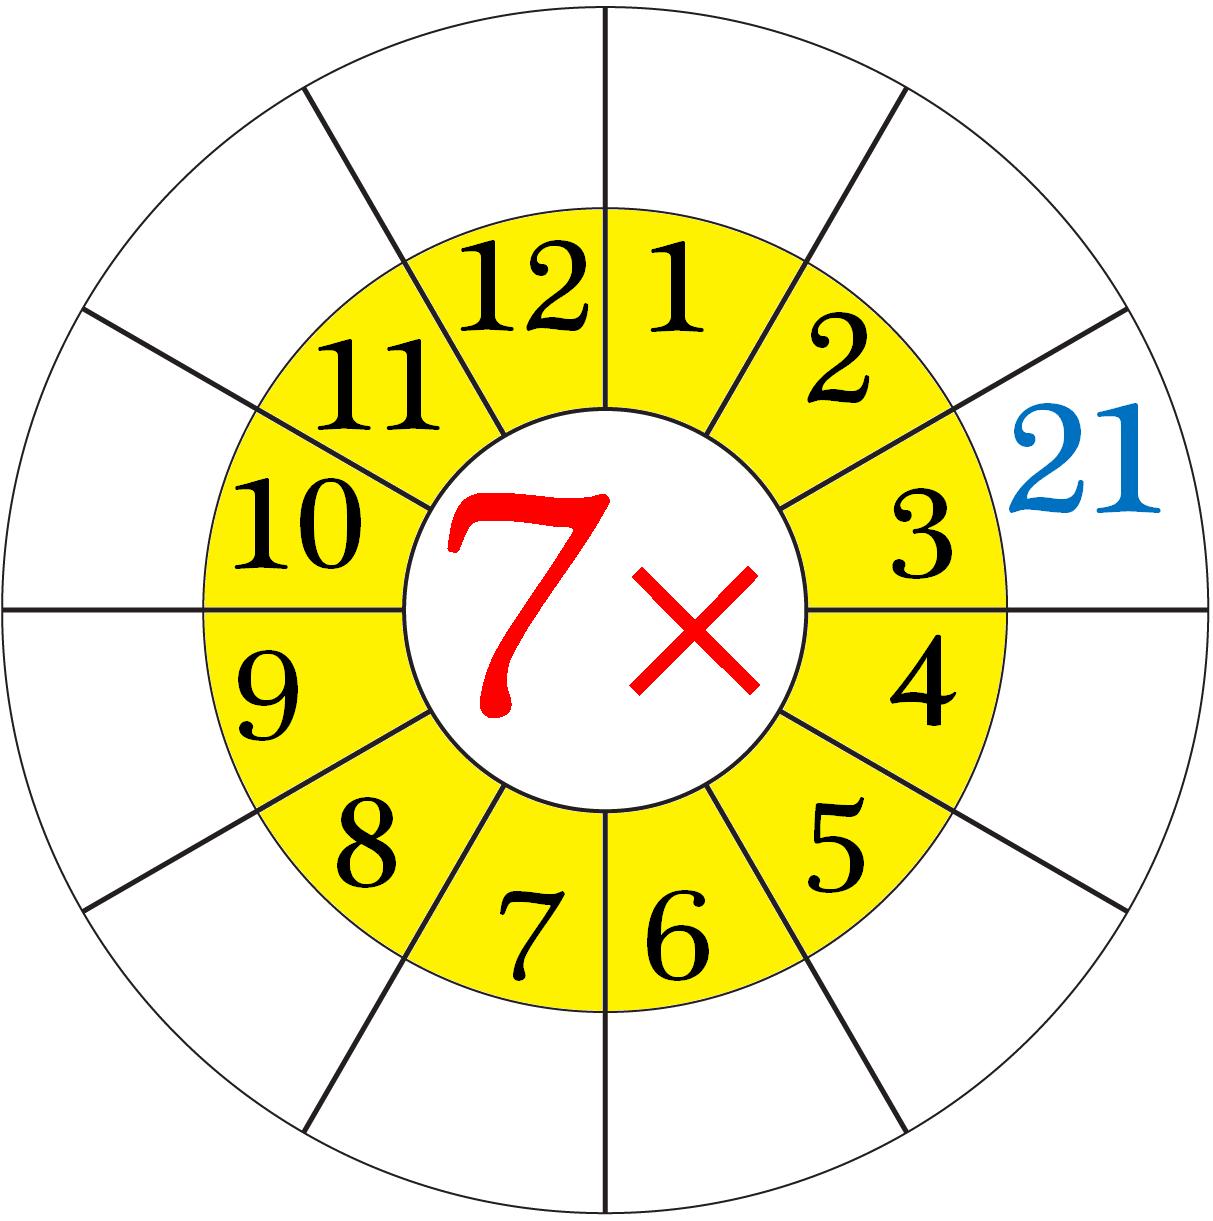 Basic Multiplication Facts Generator